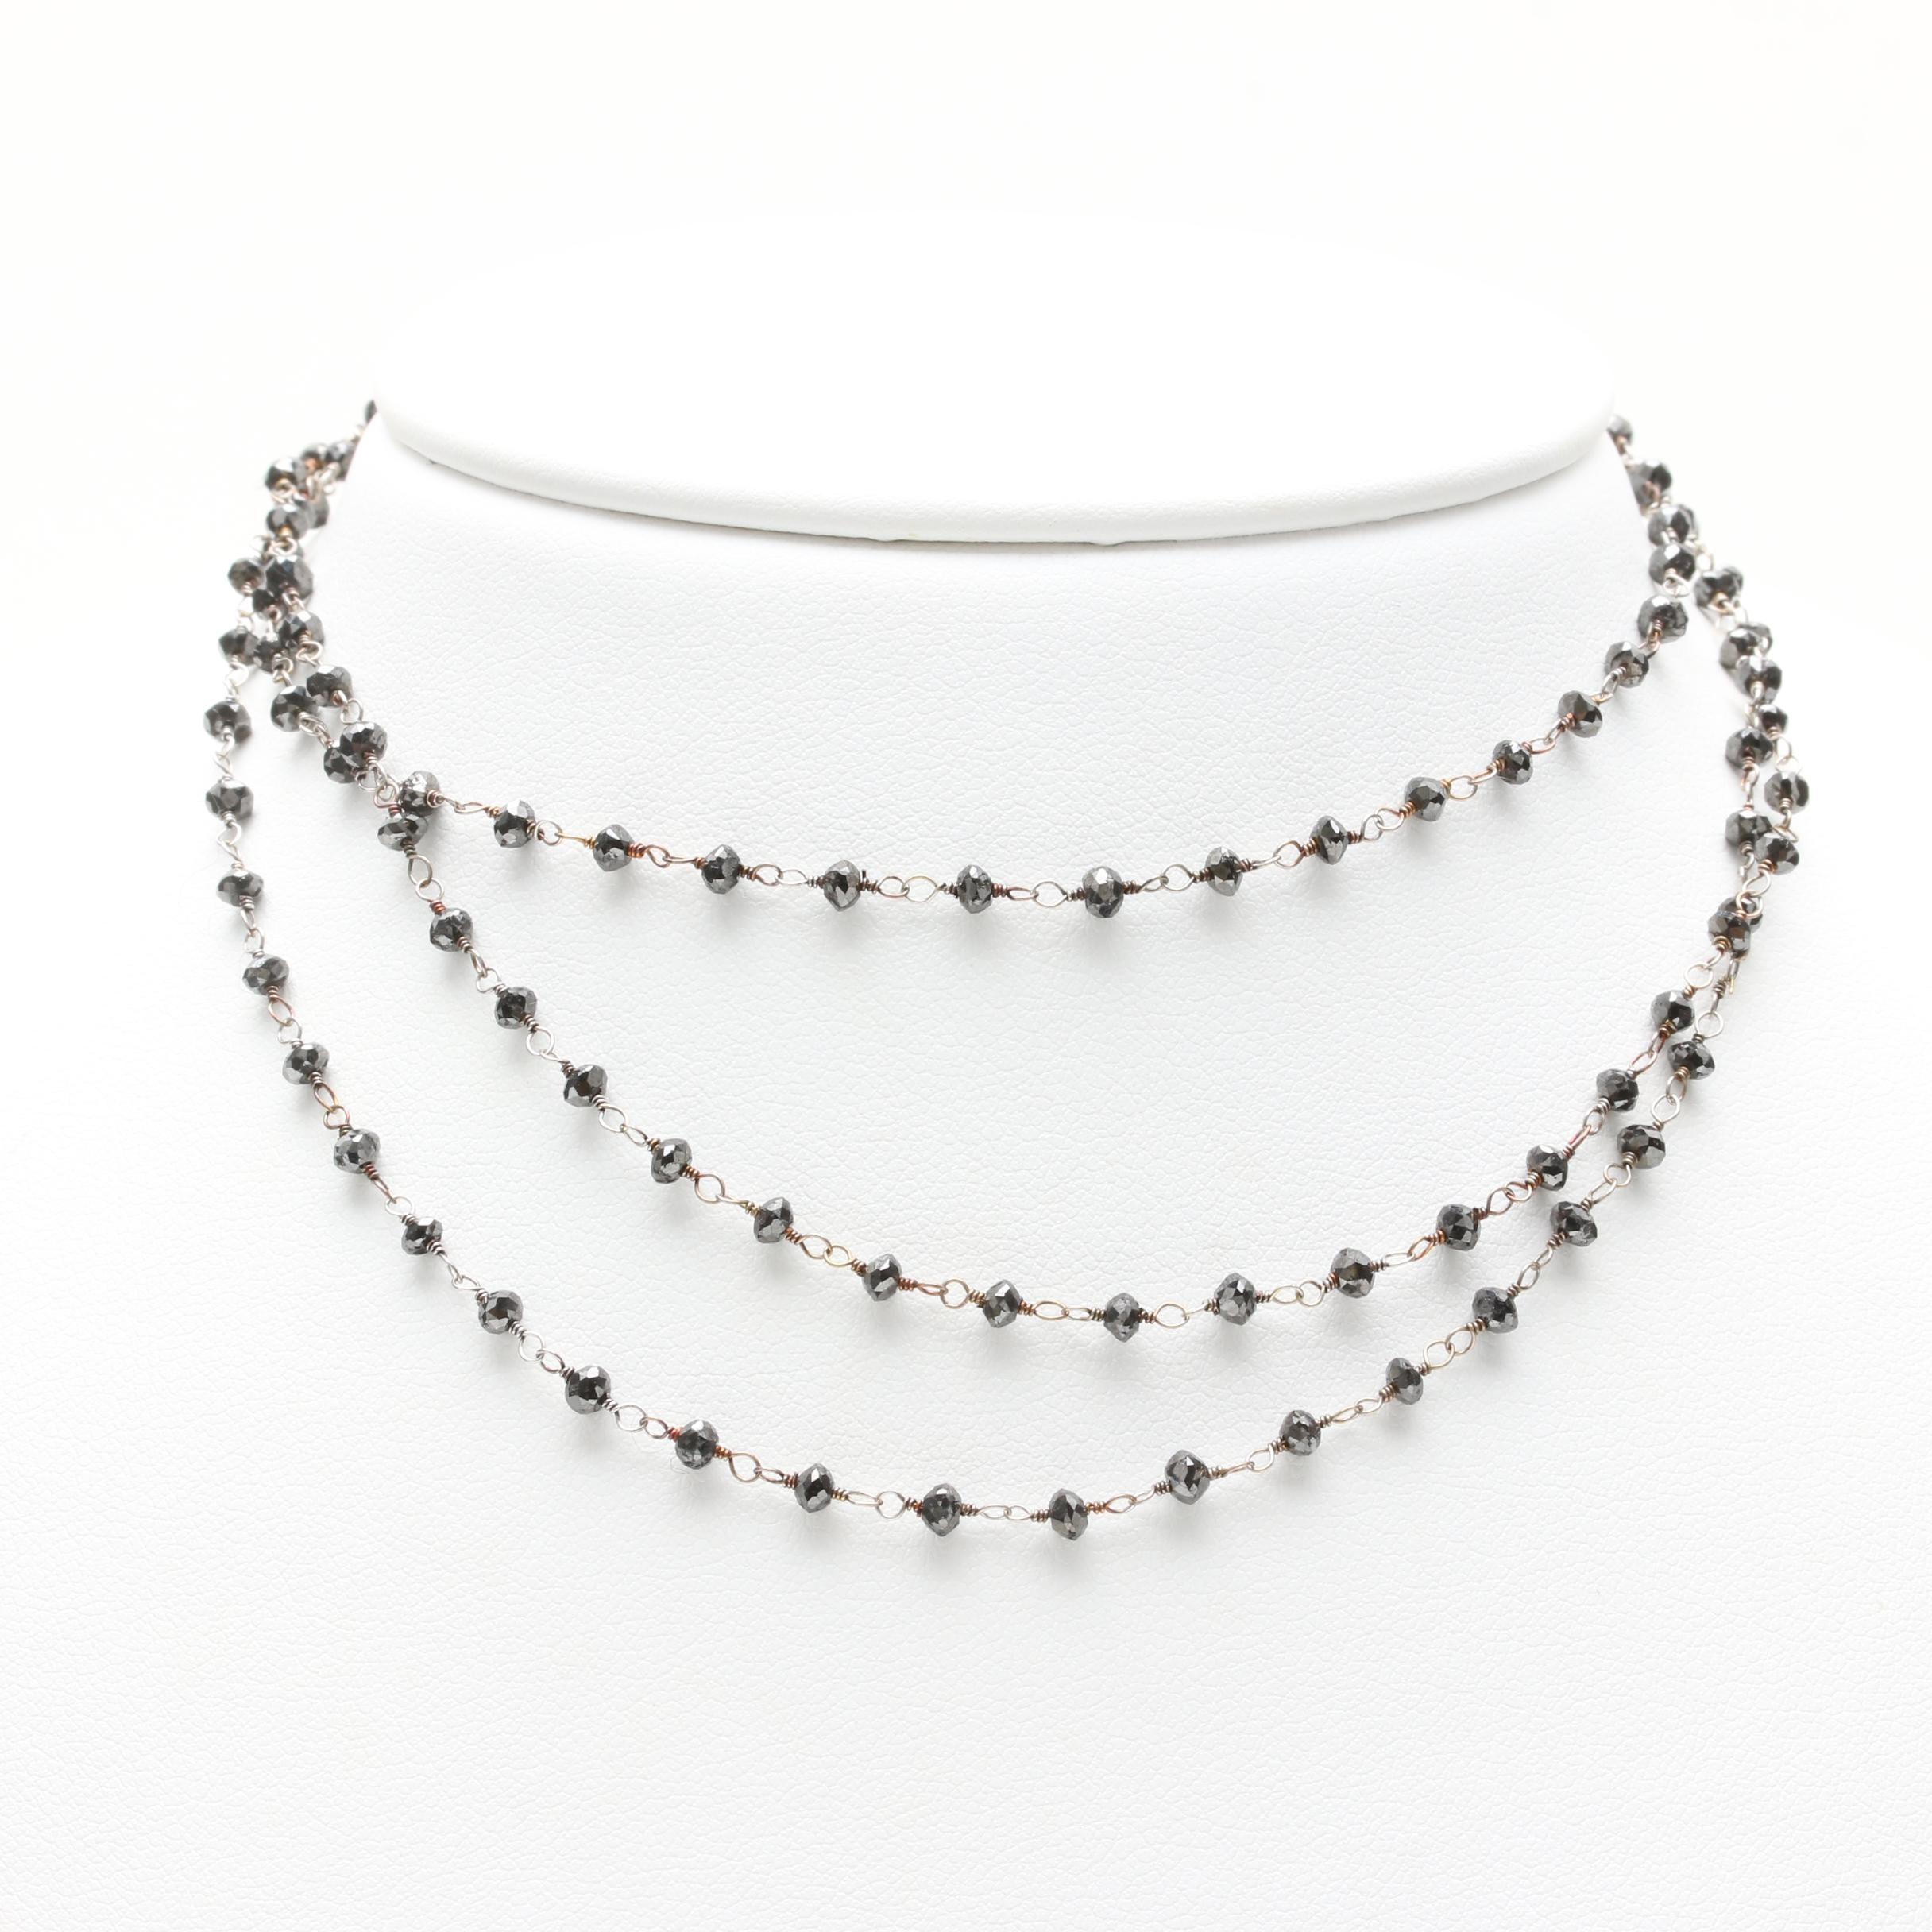 18K White Gold Black Diamond Necklace